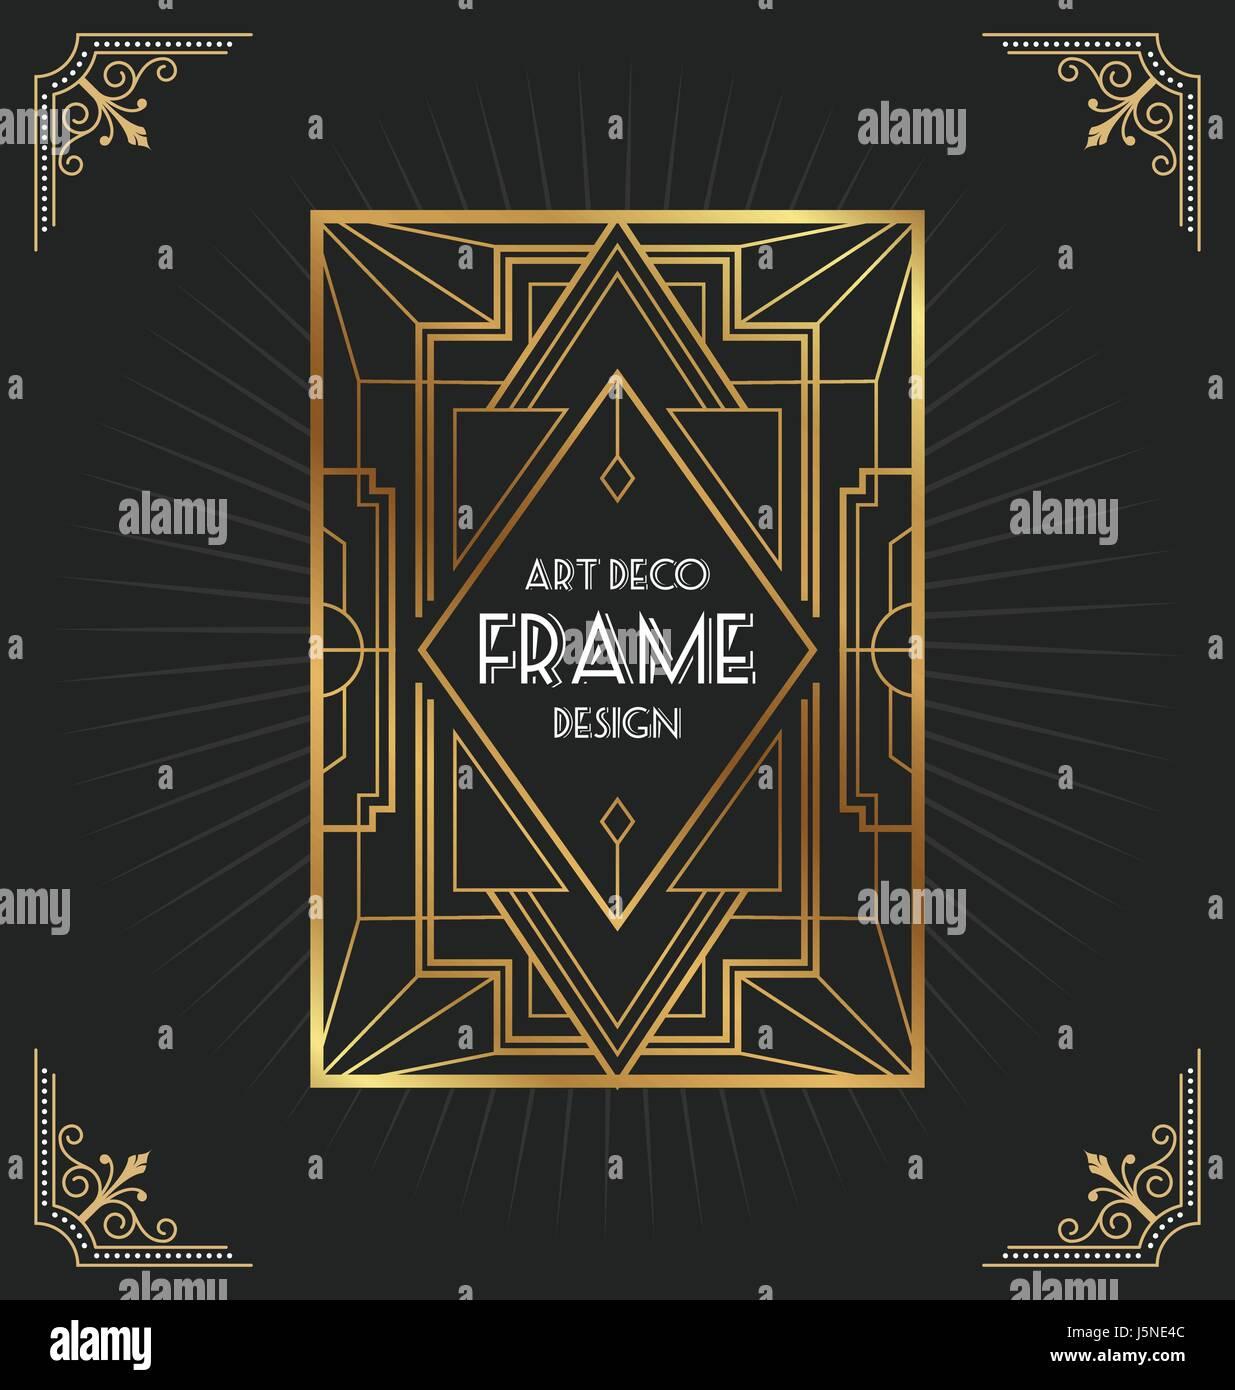 https www alamy com stock photo art deco frame design for your design such as invitation print banner 141228316 html